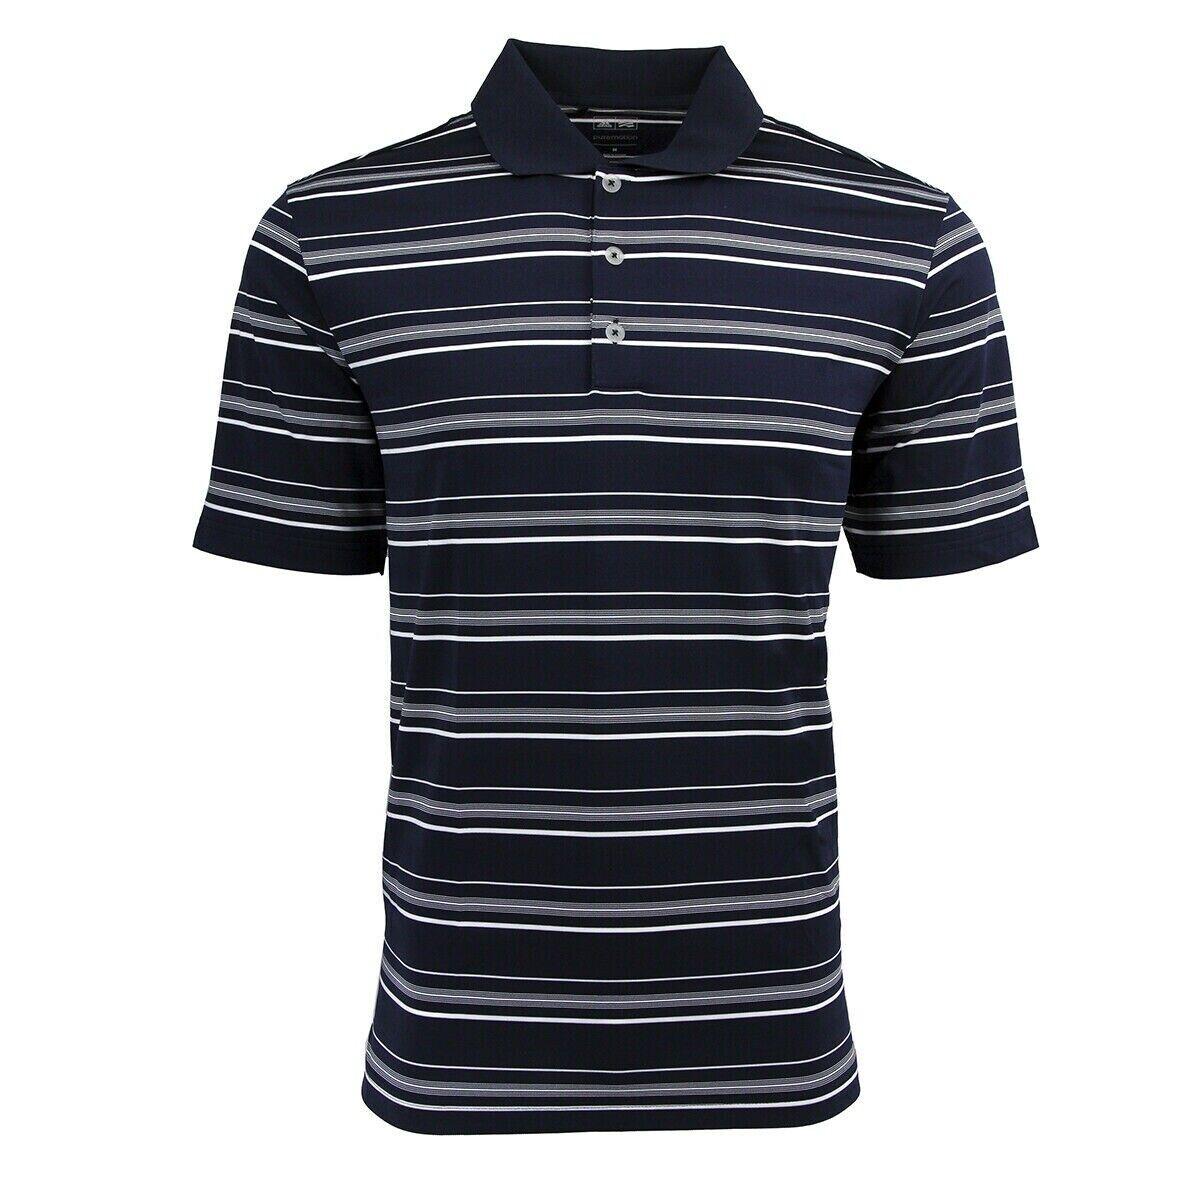 NEW Mens ADIDAS Puremotion Textured Stripe Golf Polo Shirt A123 Navy White 3XL